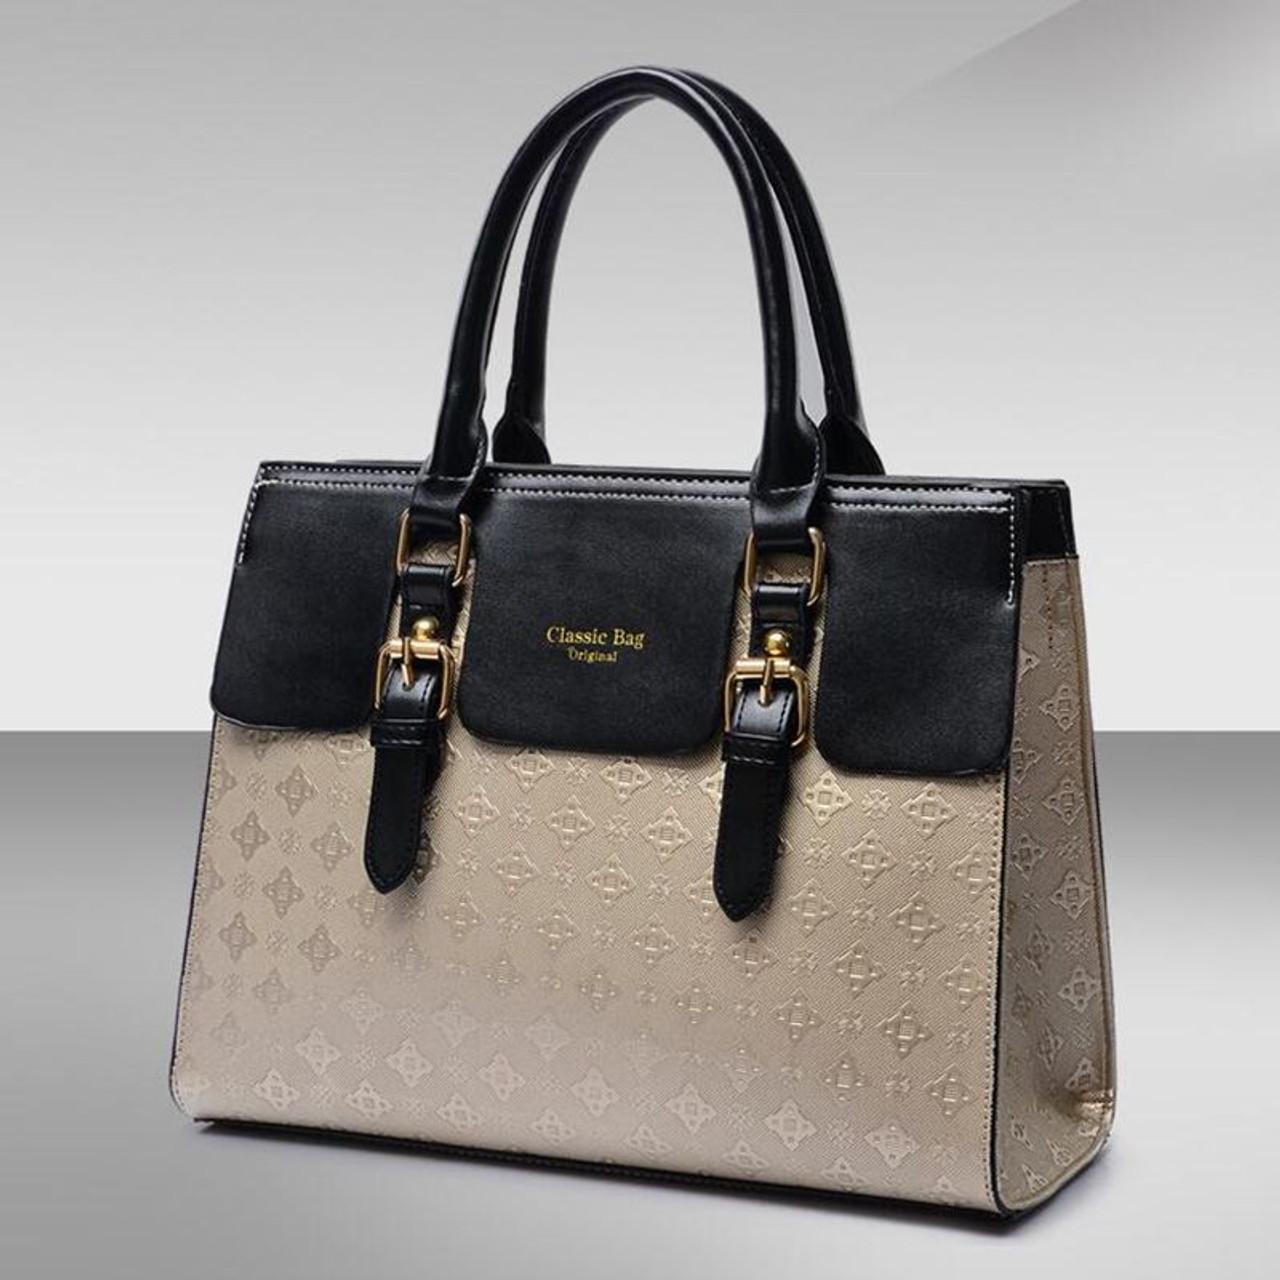 02699dd317b 5Piece/Set 2018 New Women Bags Leather Handbags Fashion Shoulder Bag Female  Purse Ladies Crossbody Designer Brand Bolsa Feminina